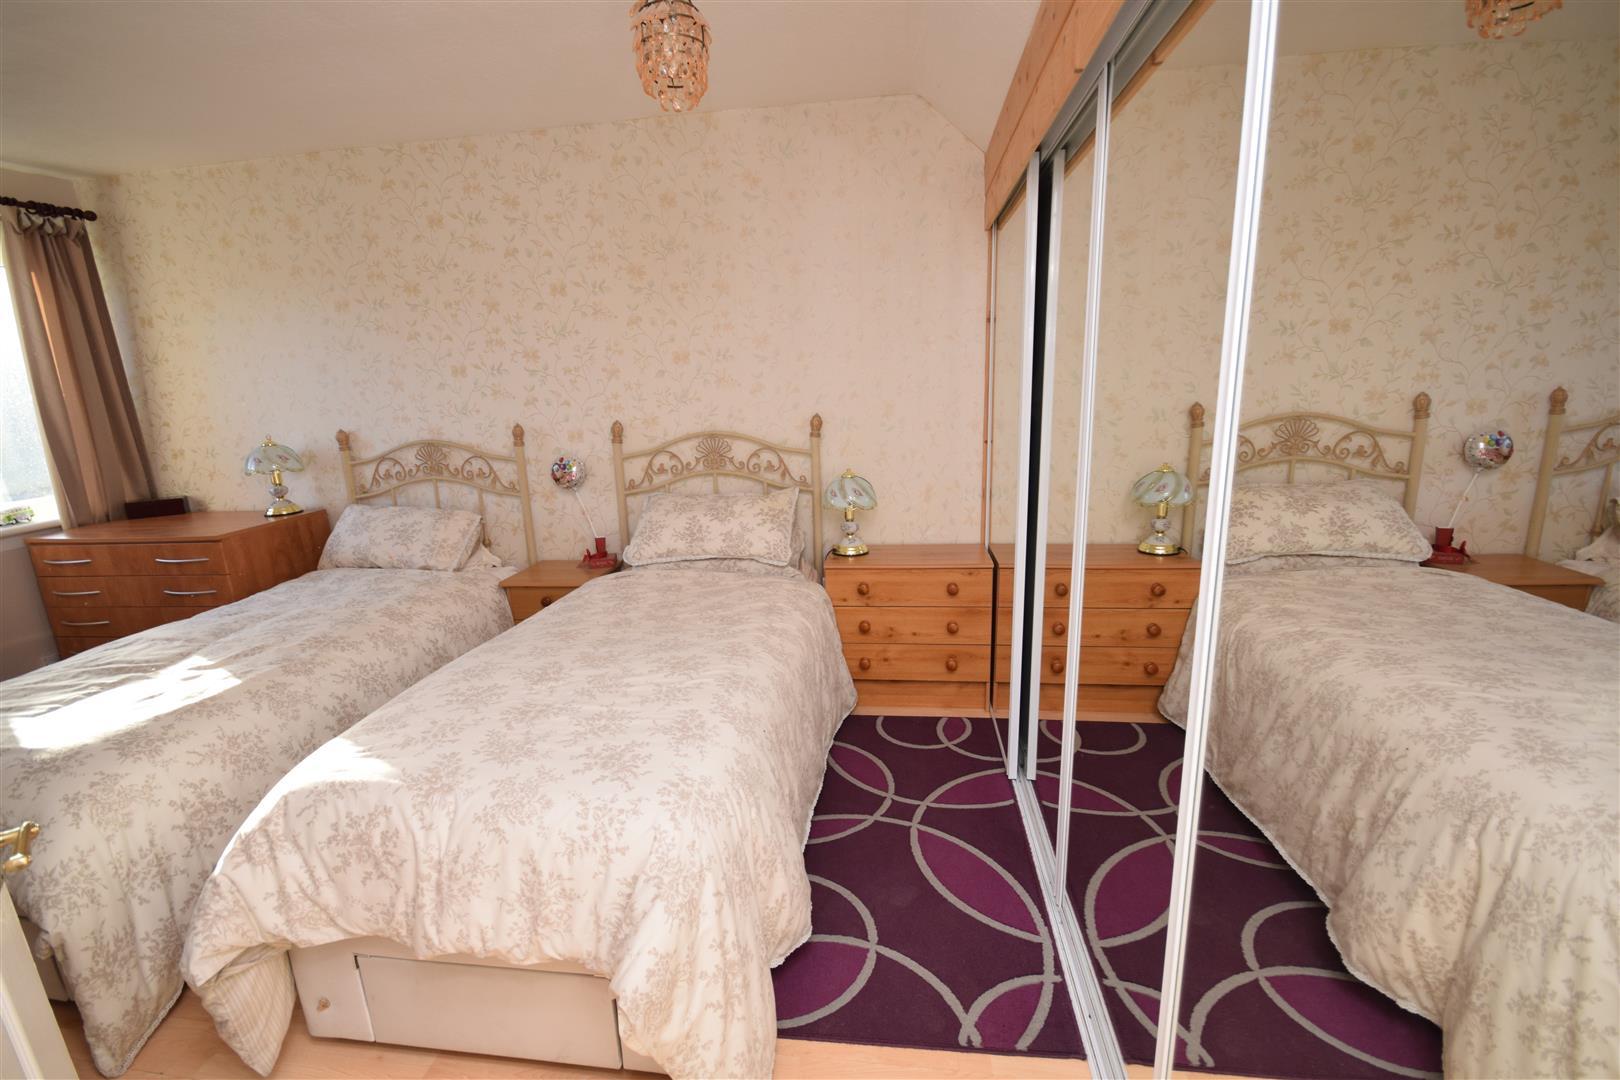 25, Croft Place, Dunning, Perth, Perthshire, PH2 0SB, UK